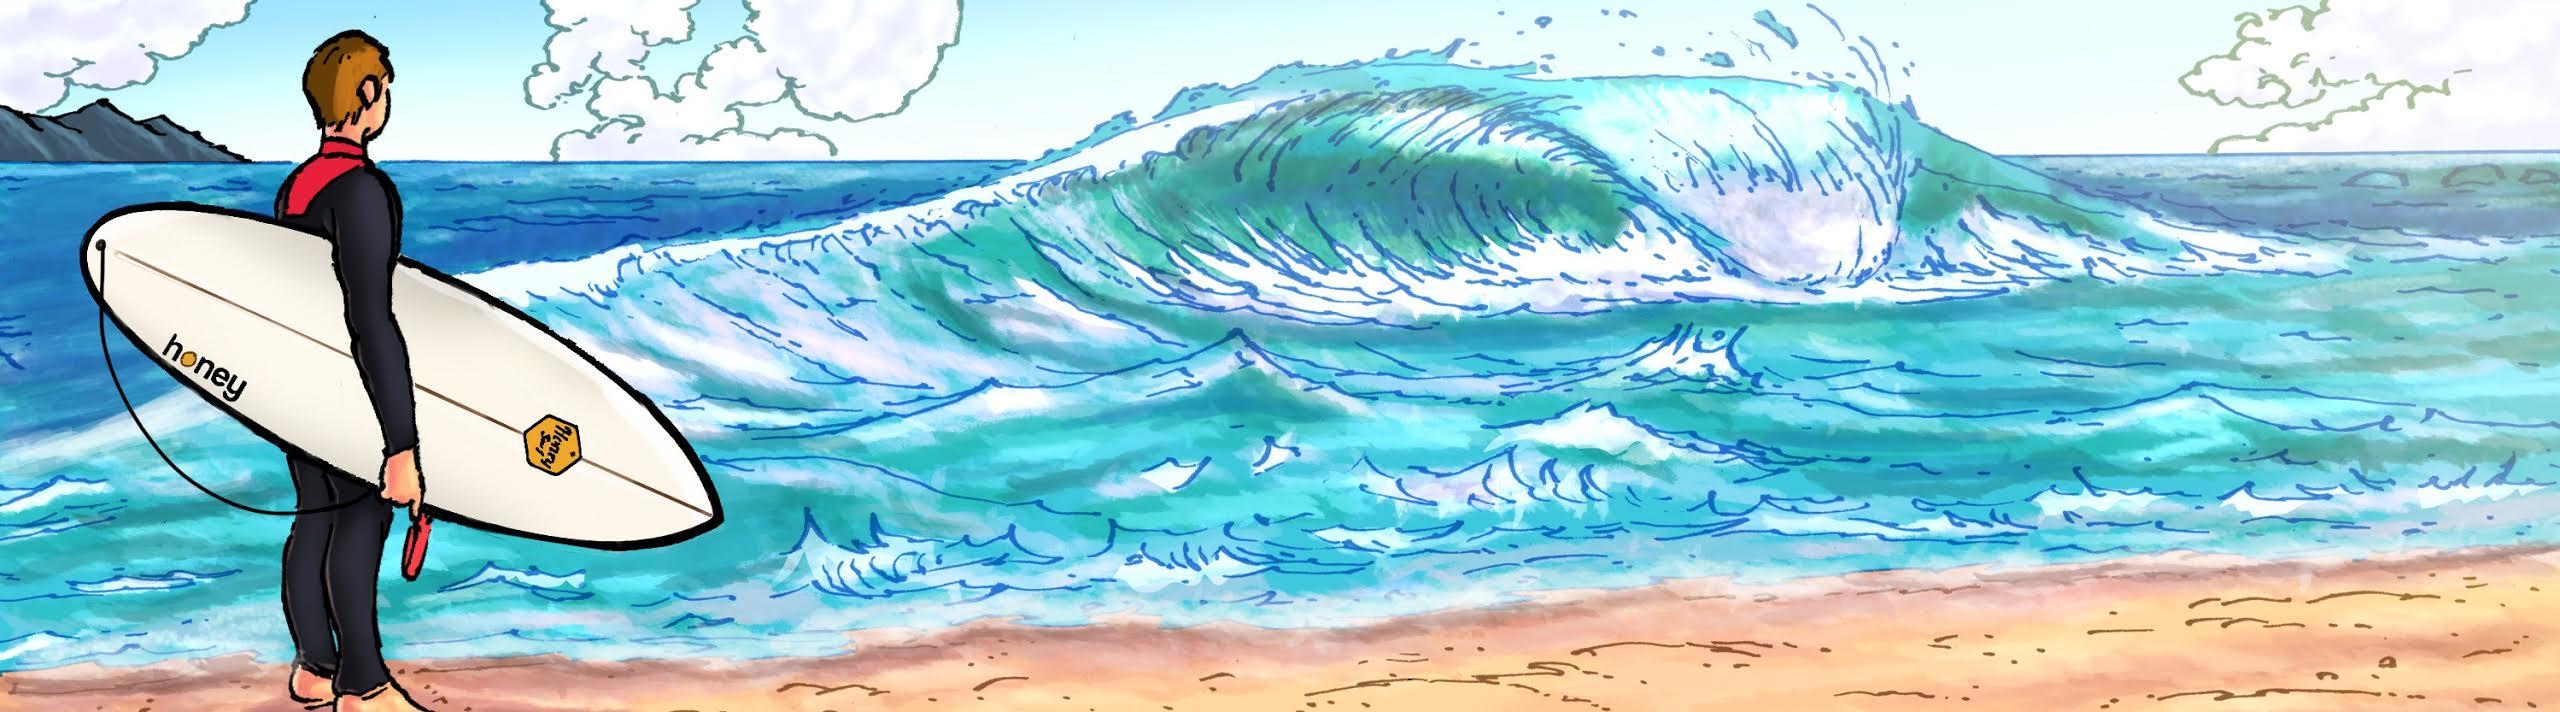 portada-comic-surf